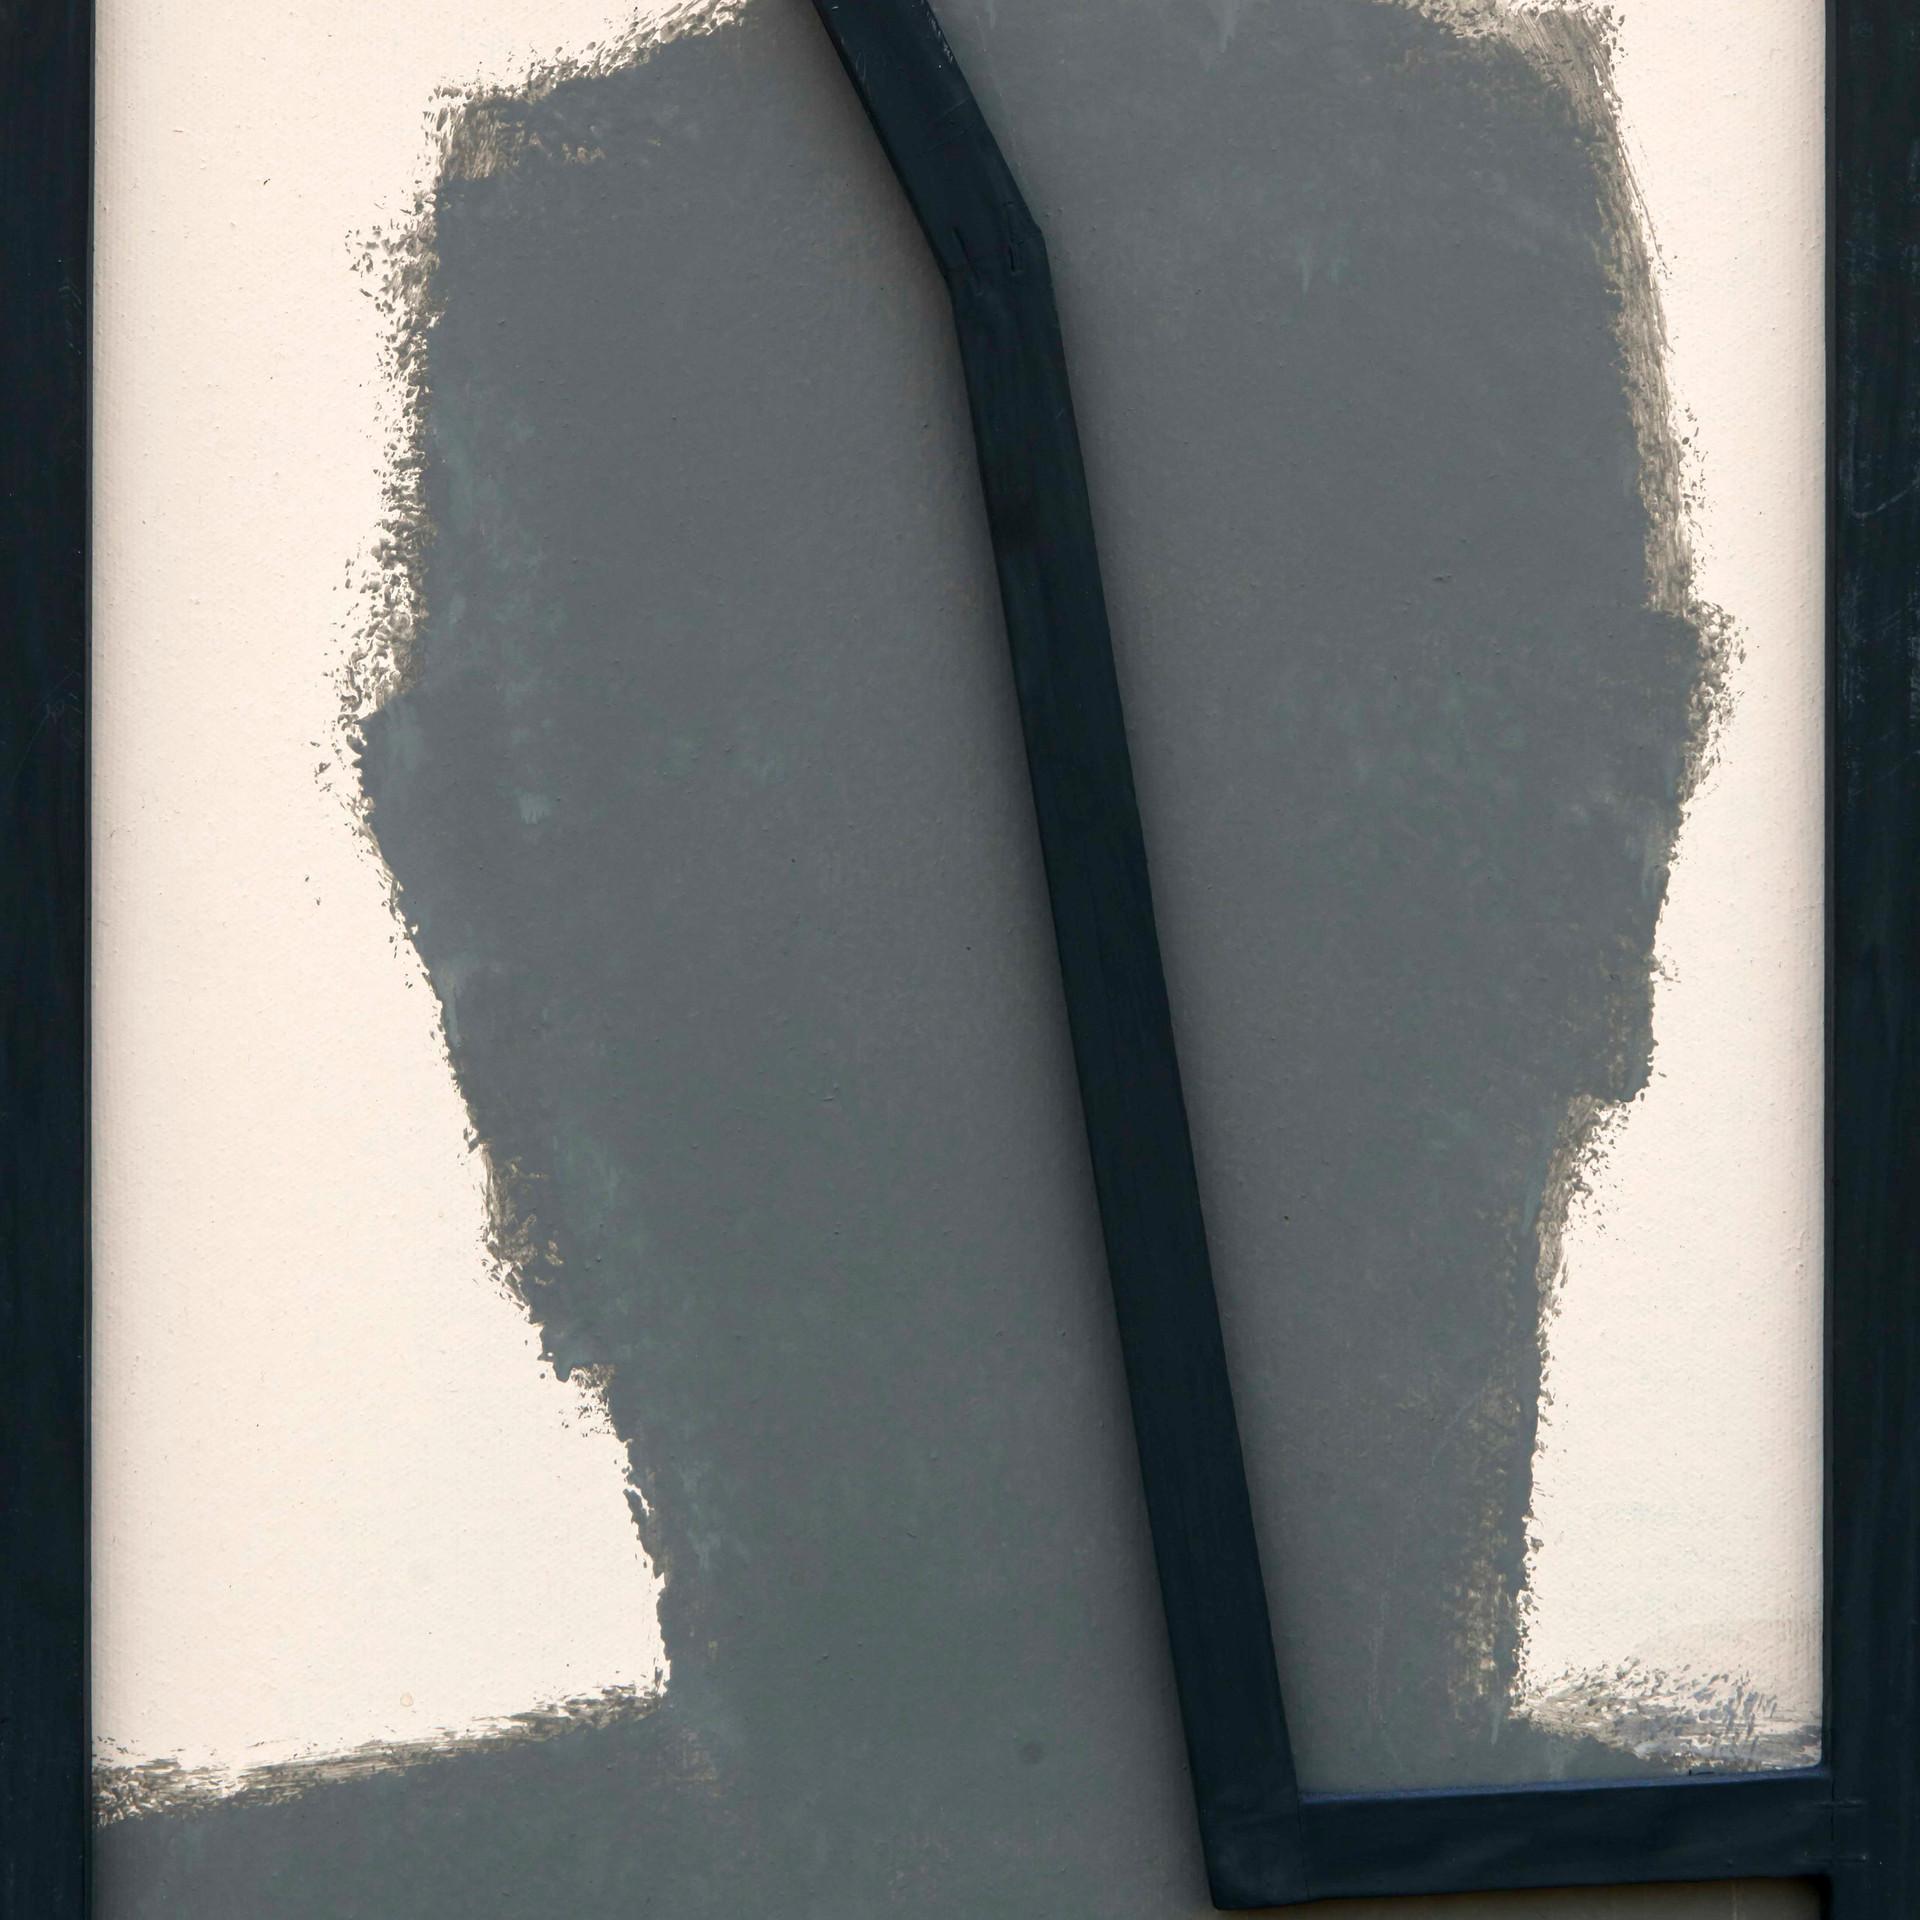 'Inn Series' Self Portrait, Wall Paint a